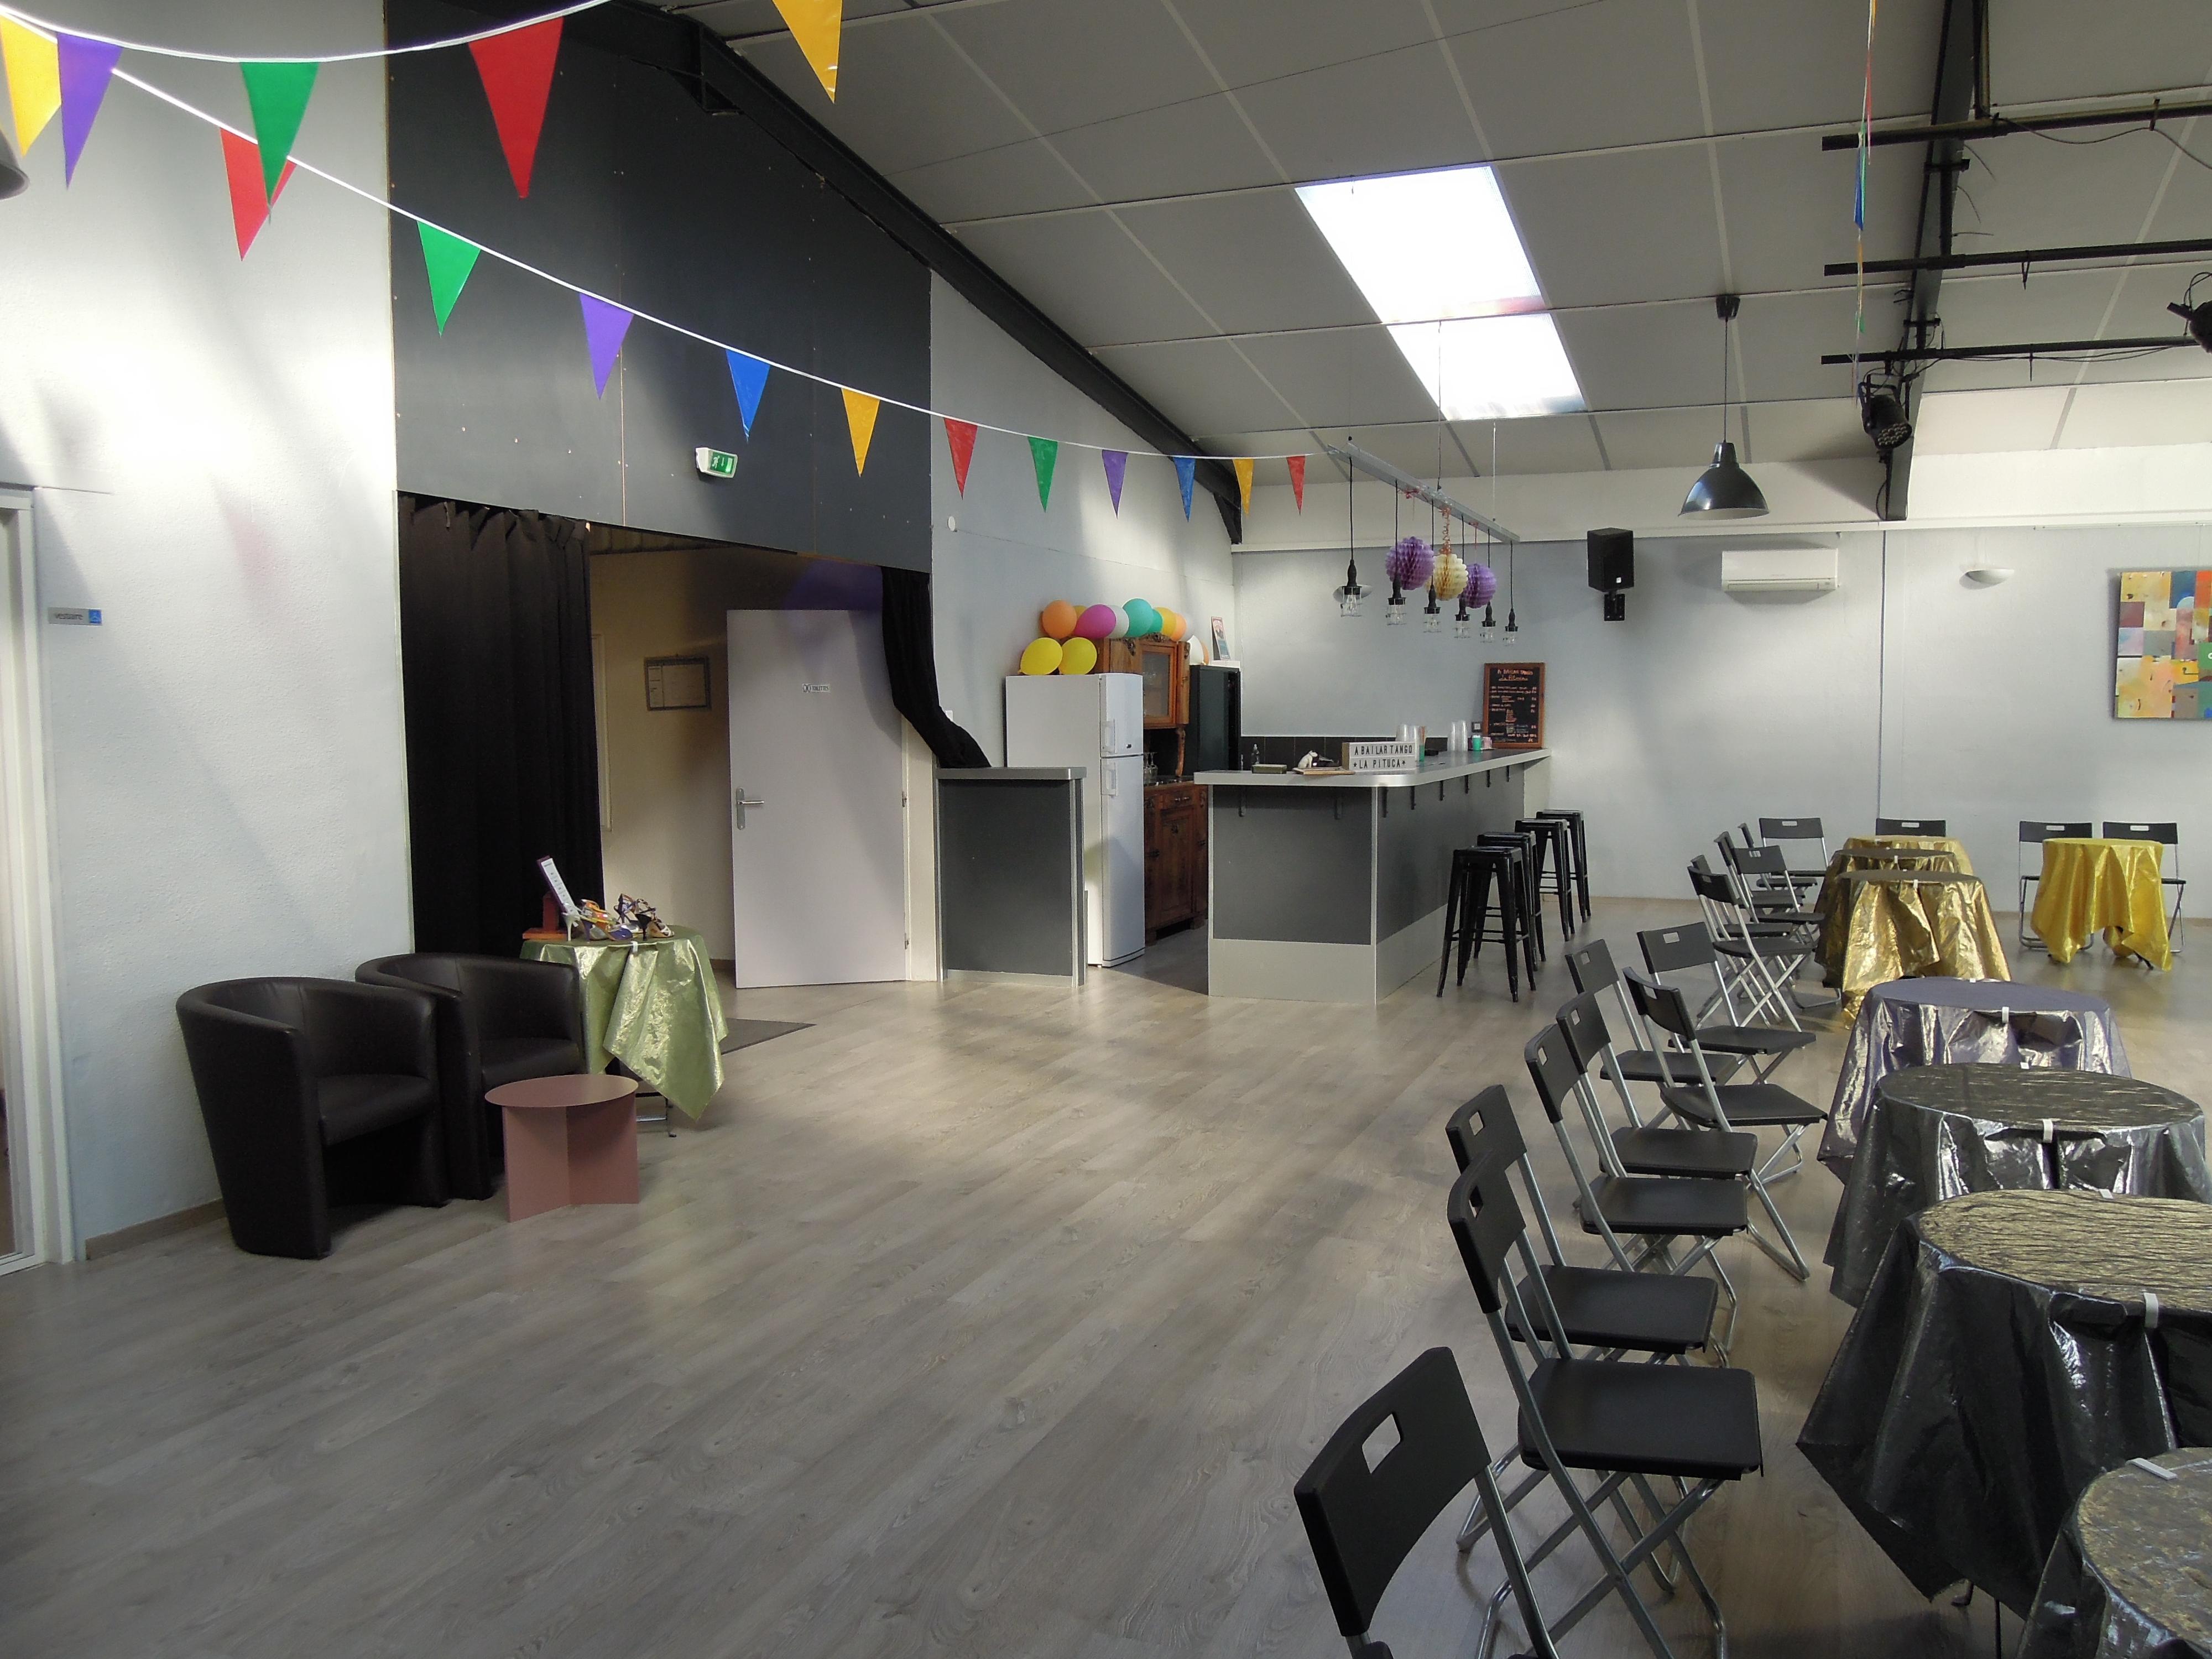 Dscn6416 el sal n de tango salle de danse montpellier for Salon ce montpellier